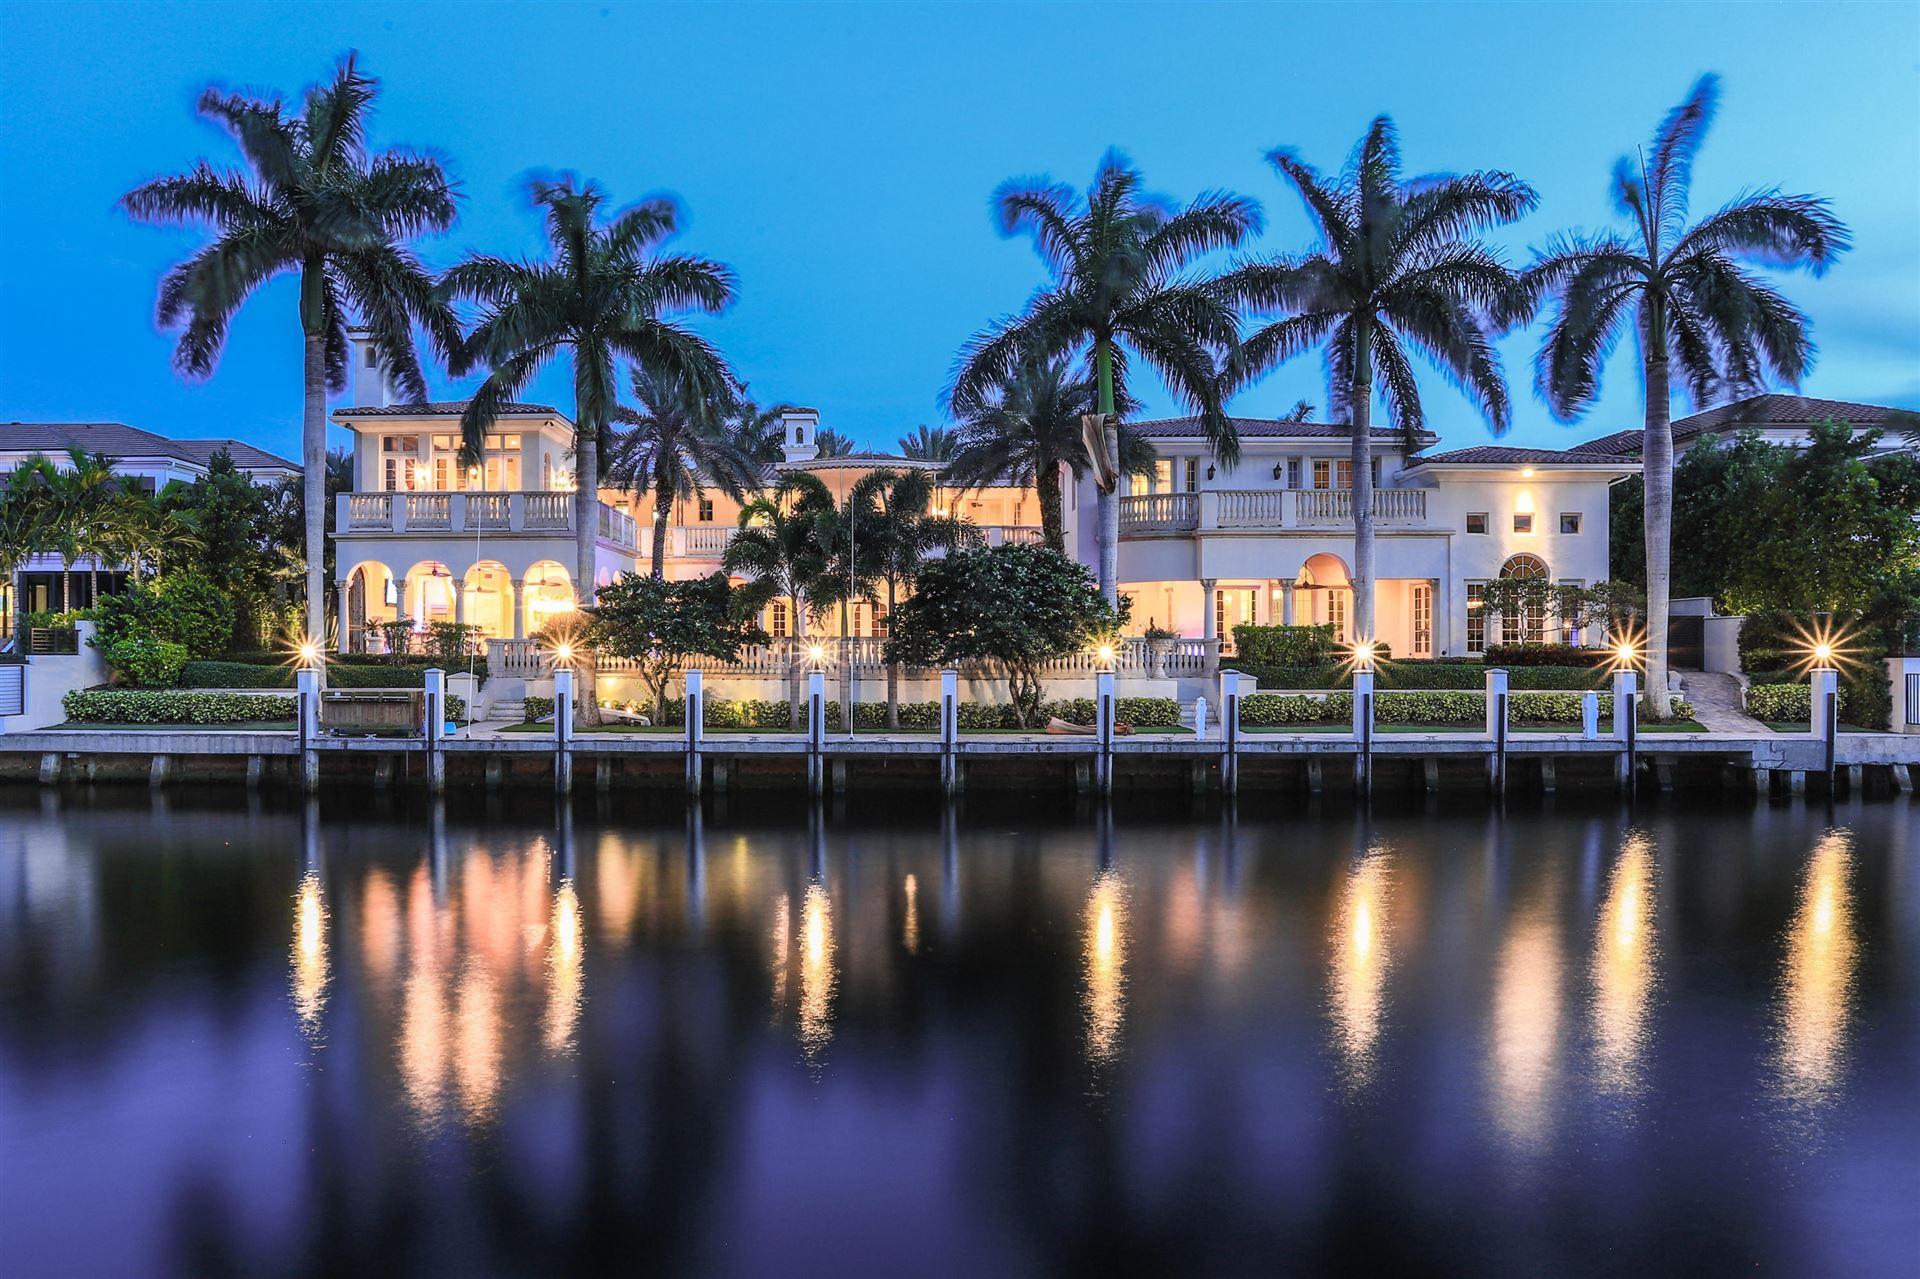 251 W Coconut Palm Road, Boca Raton, FL 33432 - #: RX-10627390